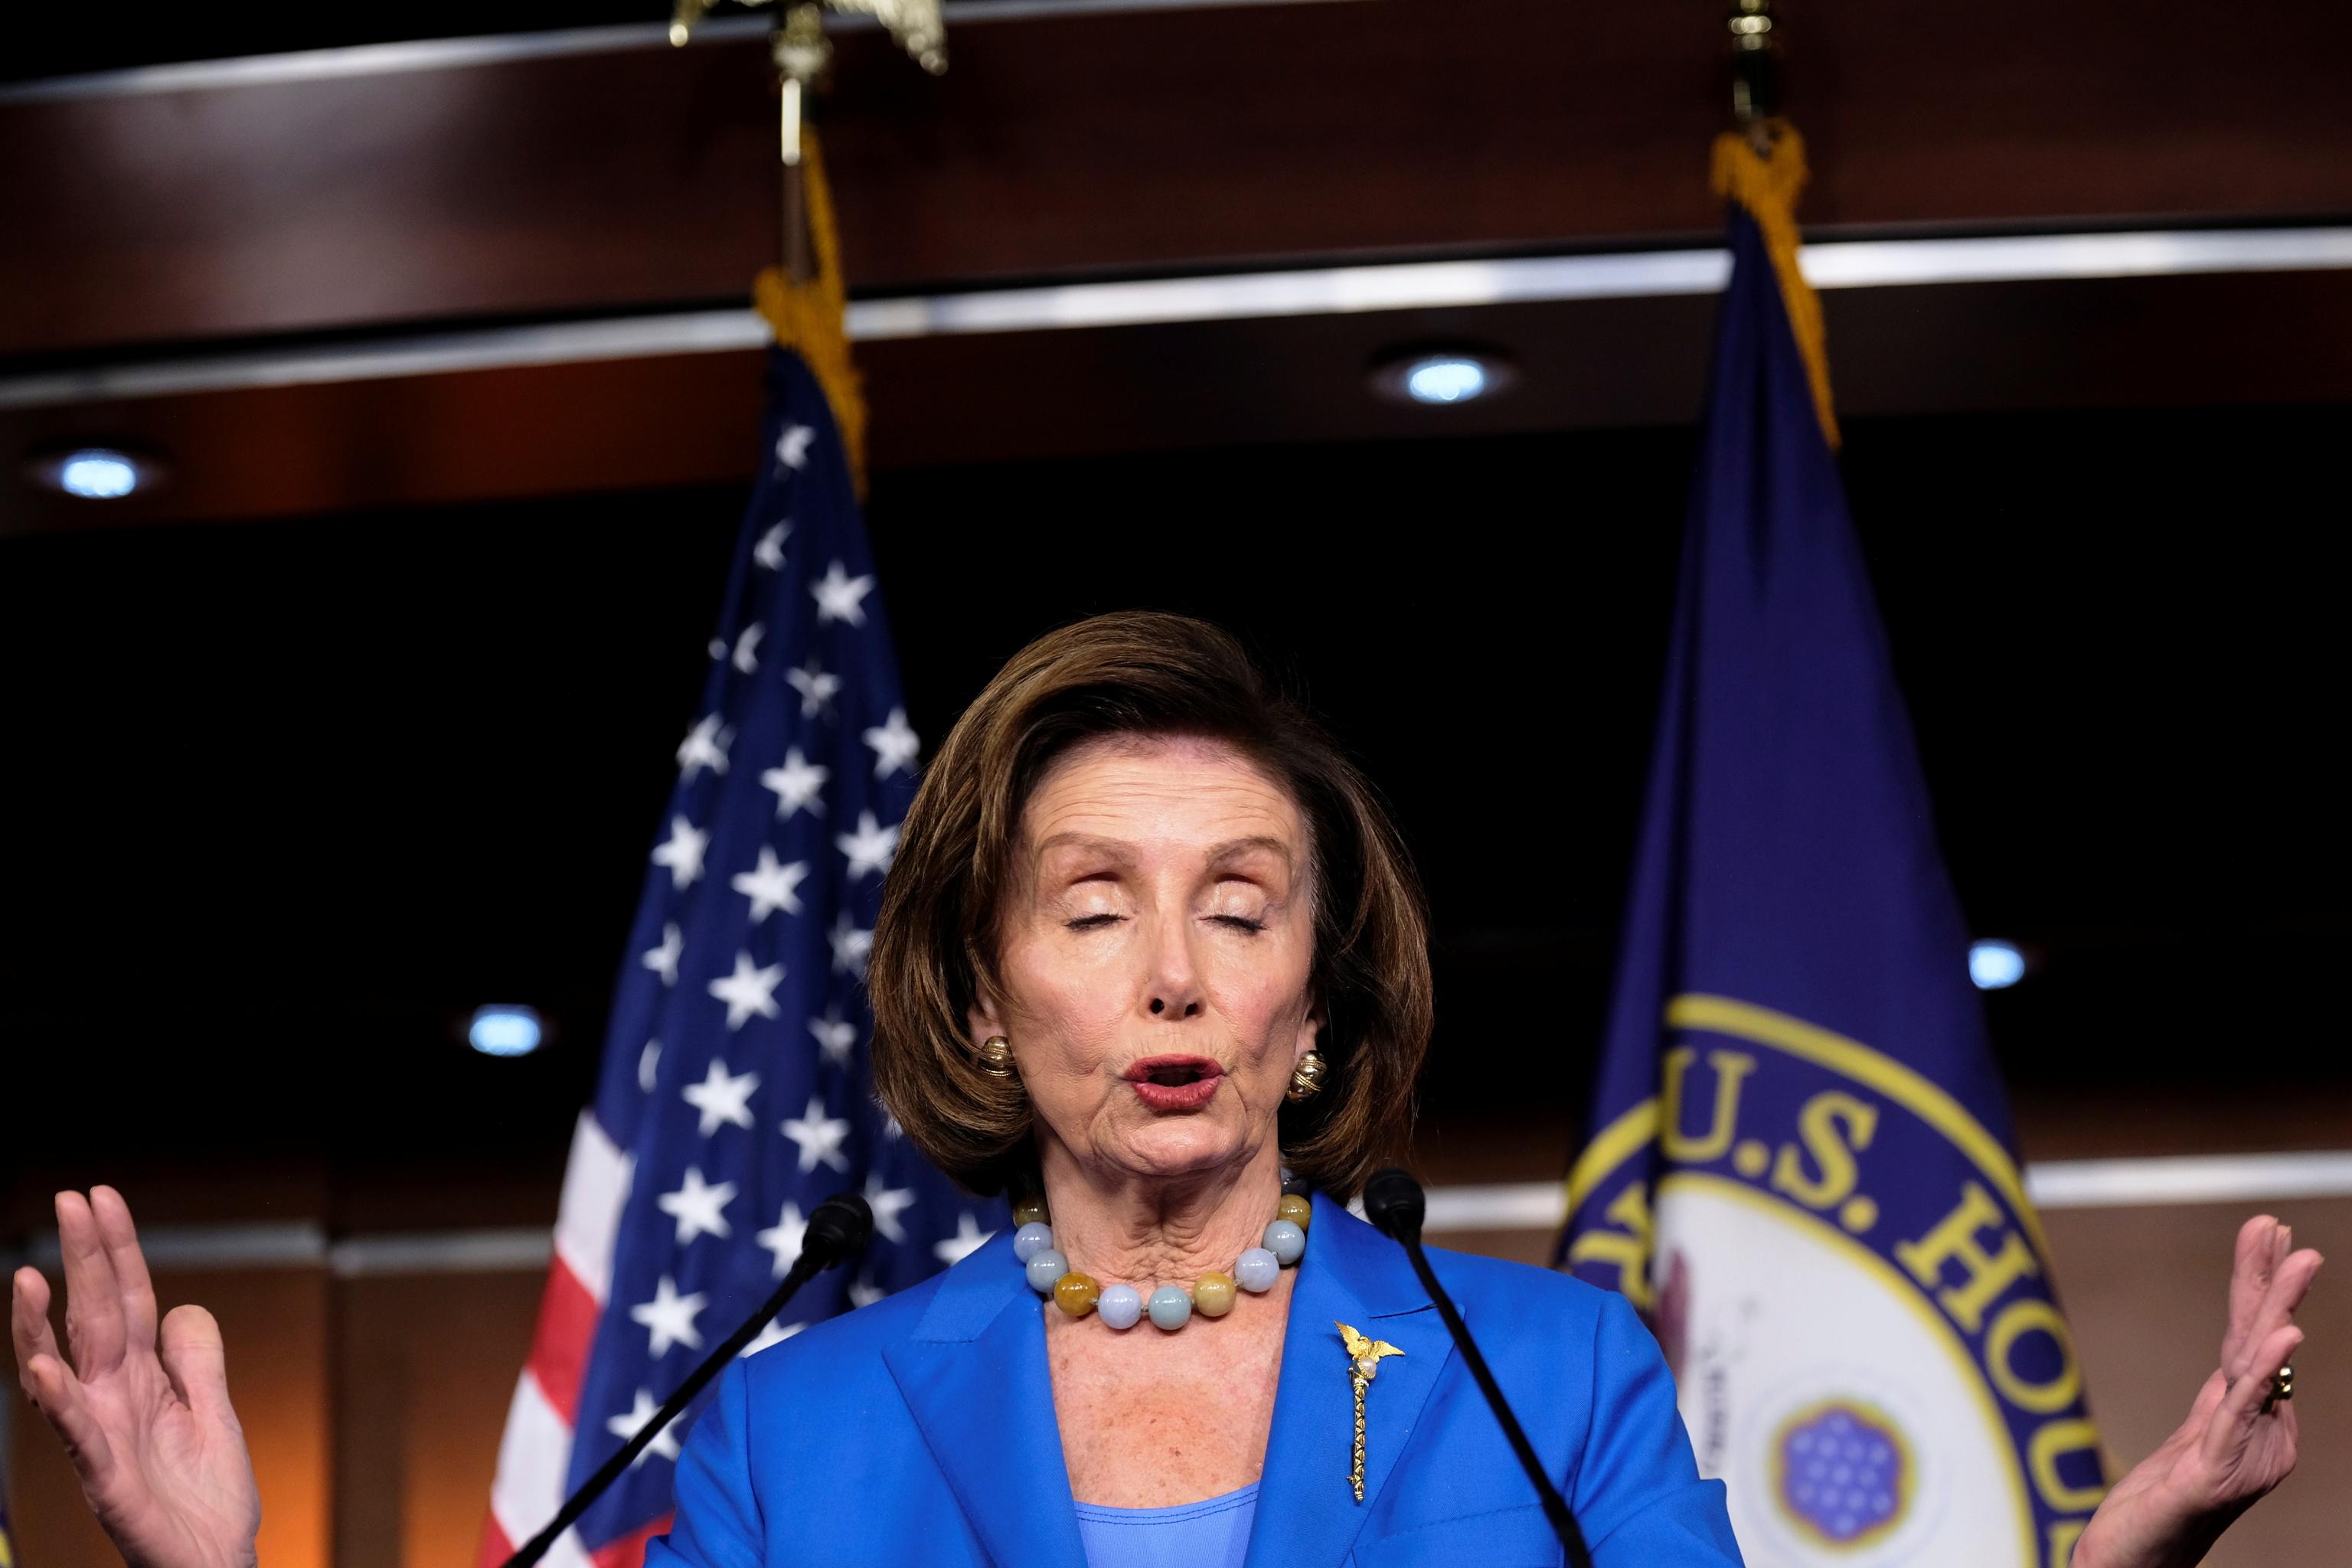 La presidenta de la Cámara de Representantes, la demócrata Nancy Pelosi.